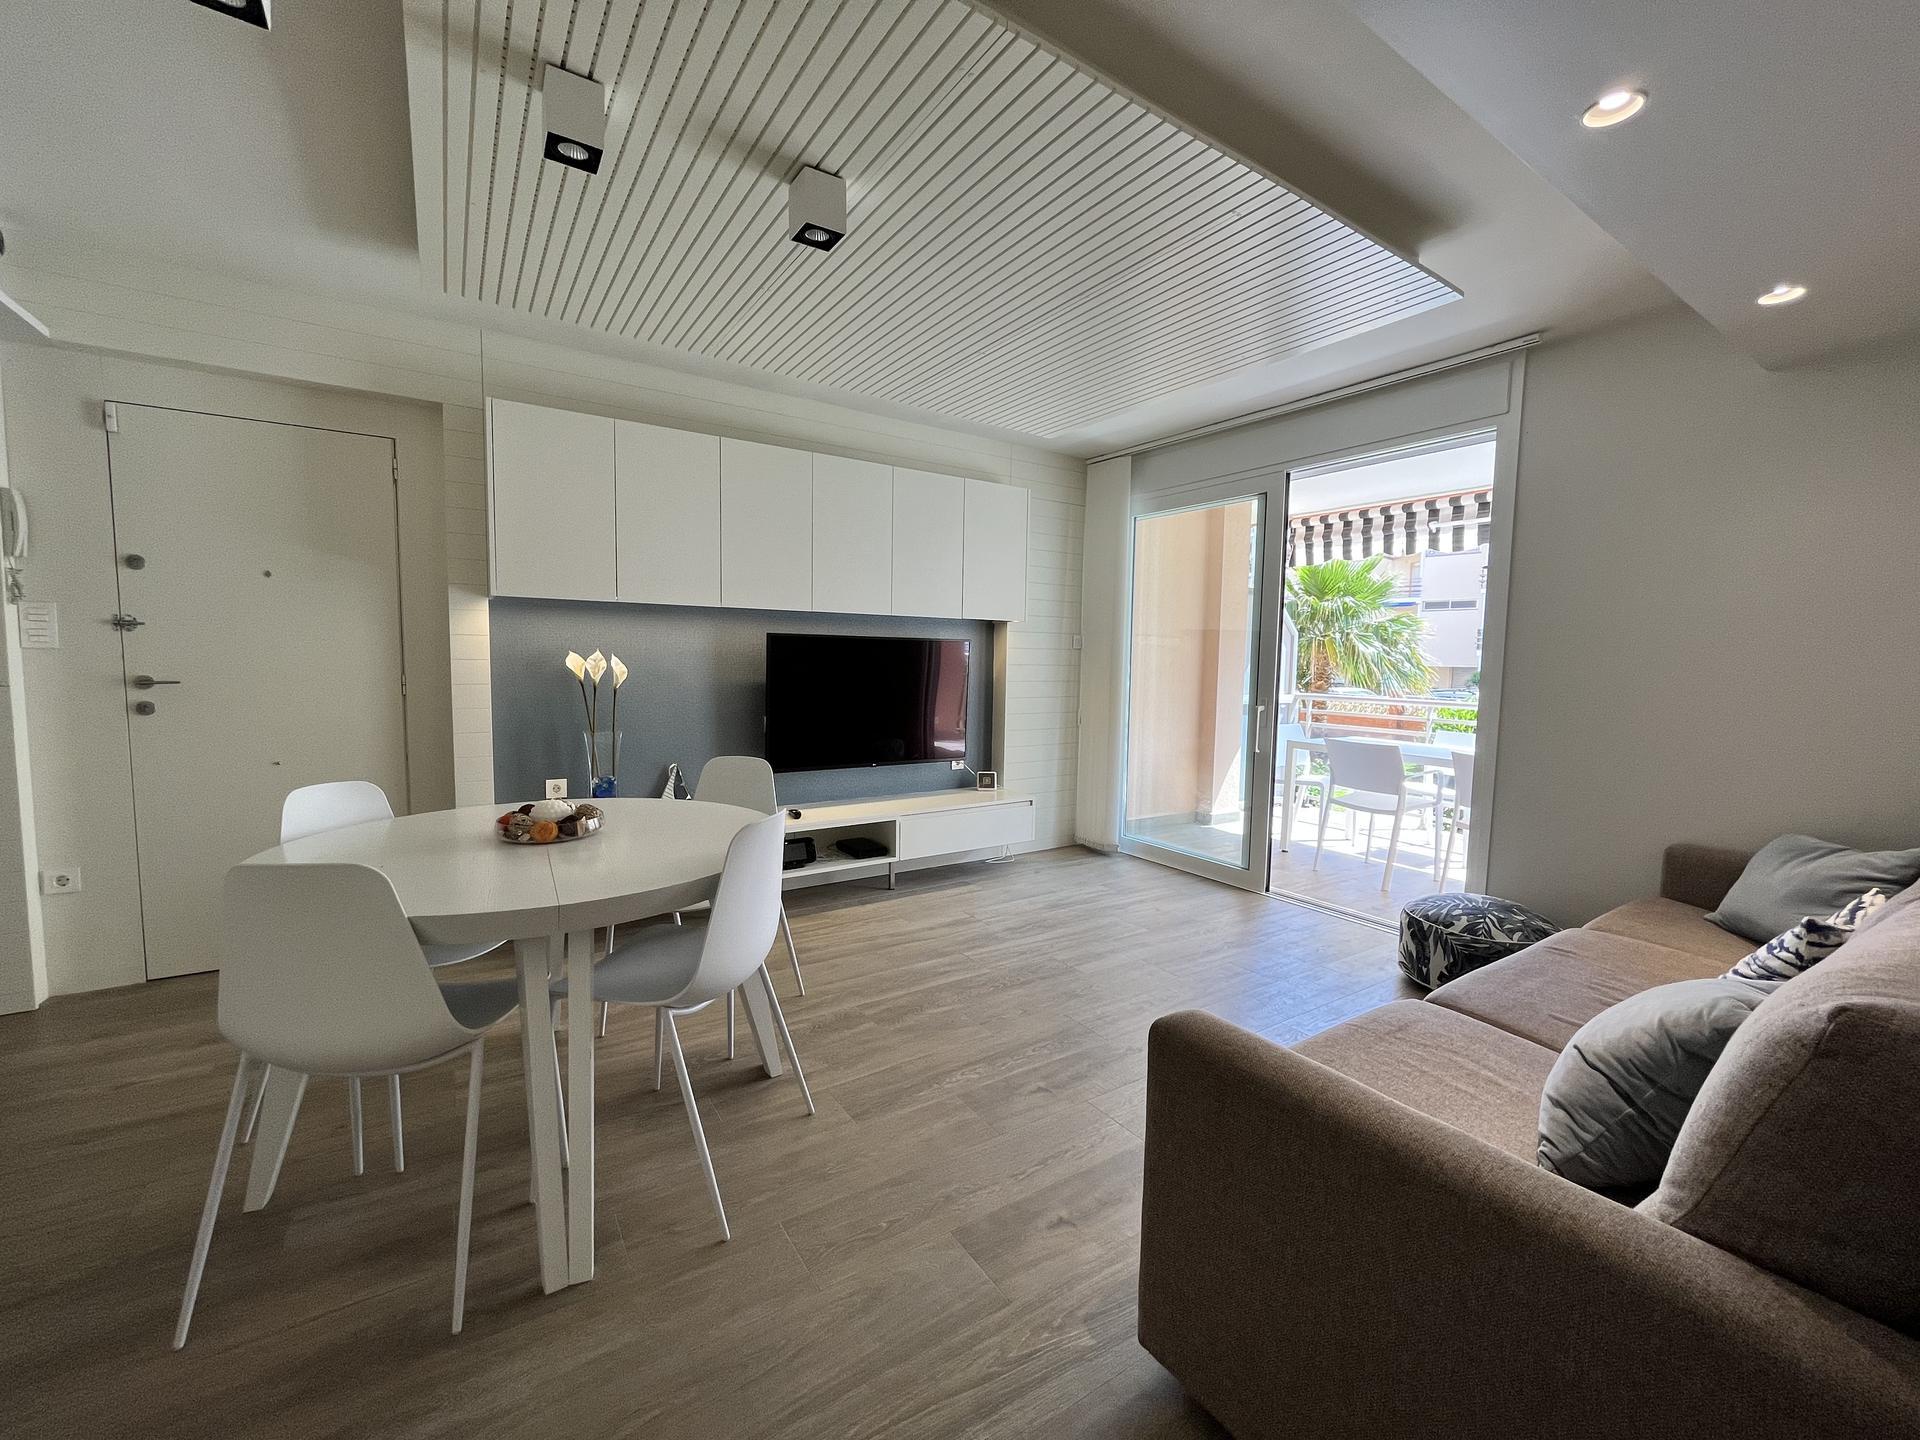 Apartamento -                                       Cambrils -                                       3 dormitorios -                                       8 ocupantes